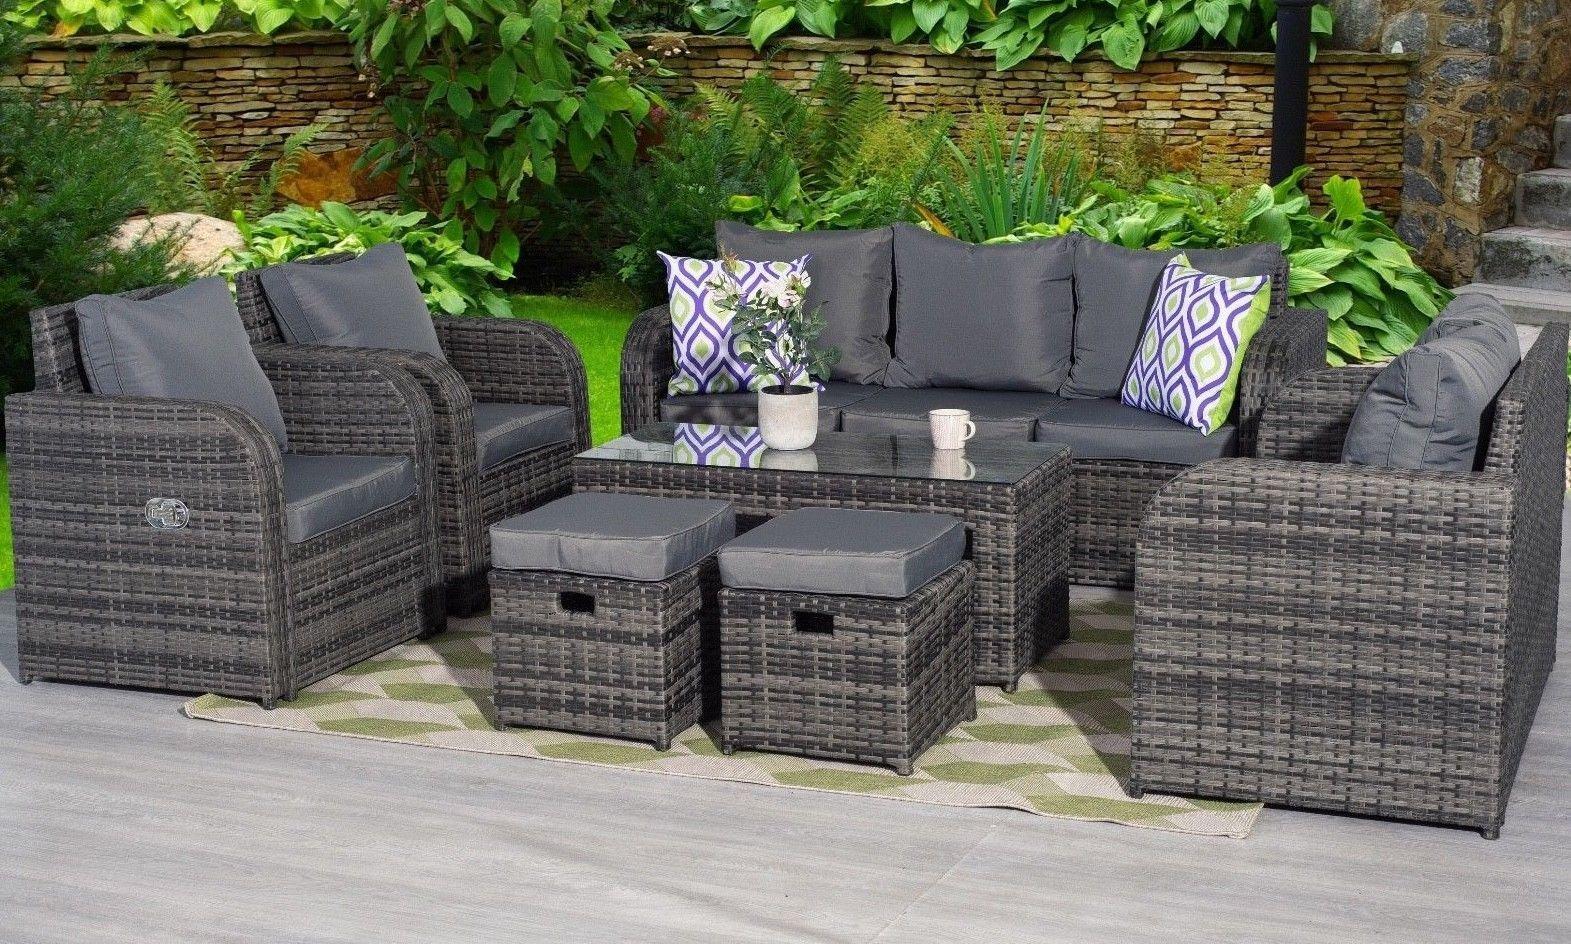 629 9 Seater Brown Rattan Reclining Sofa Set Furniture Maxi Furniture Sofa Set Rattan Garden Furniture